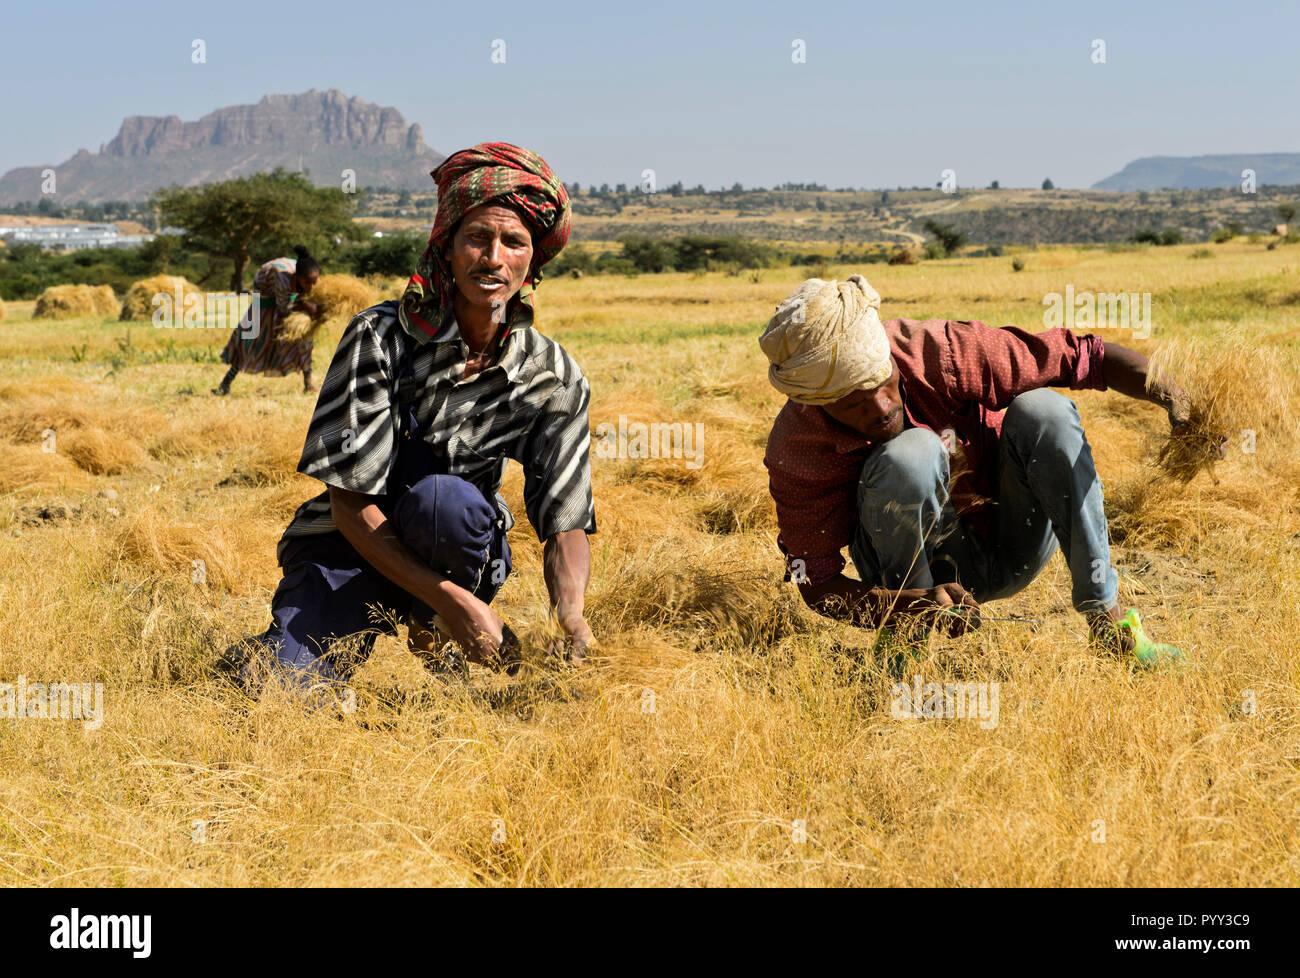 Farmers harvesting Teff (Eragrostis tef) with the sickle, Hawzien, Tigray, Ethiopia - Stock Image